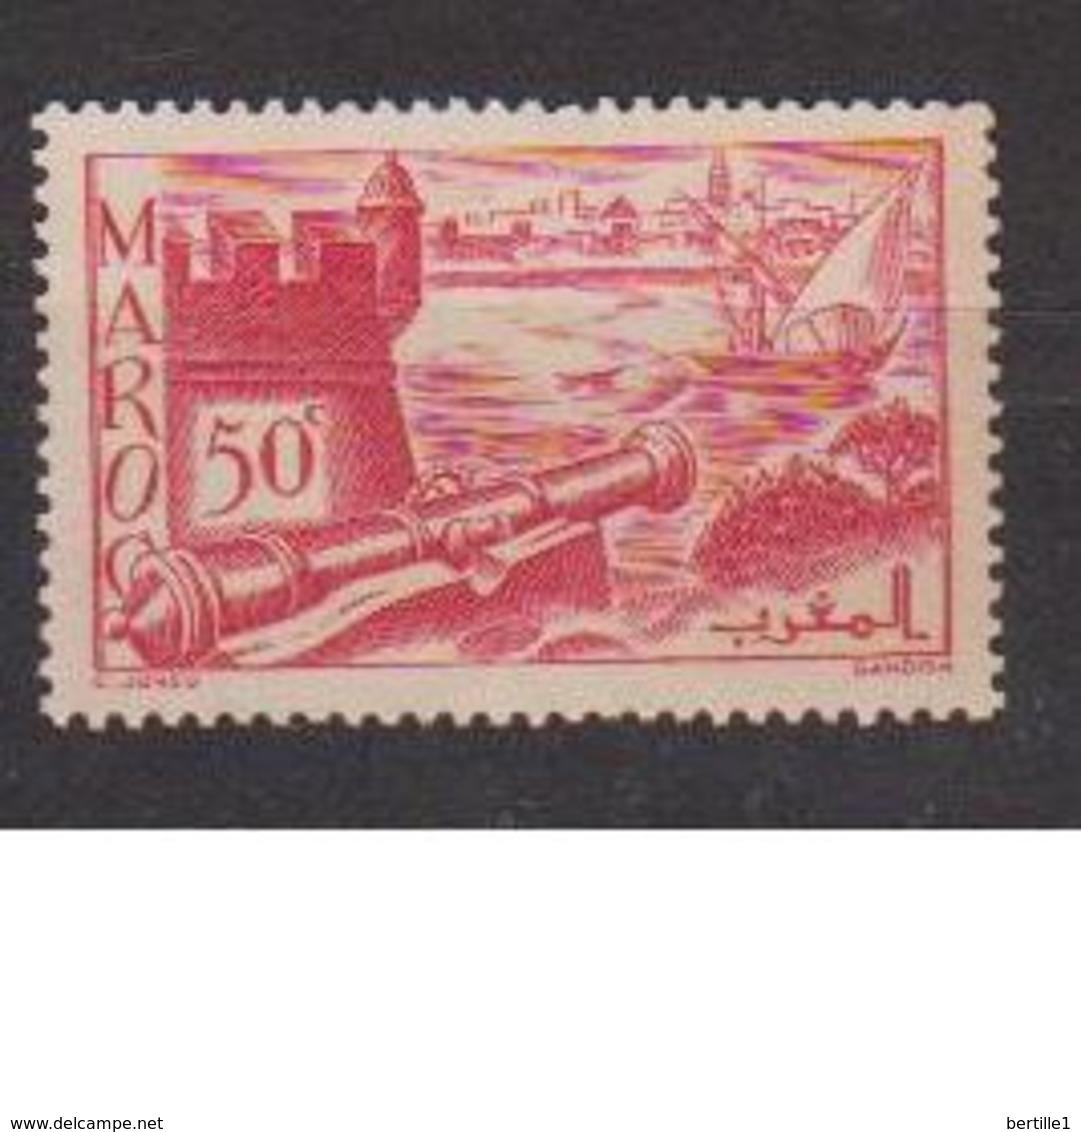 MAROC        N° YVERT   173   NEUF SANS GOMME     (  SG   01/33 ) - Maroc (1891-1956)